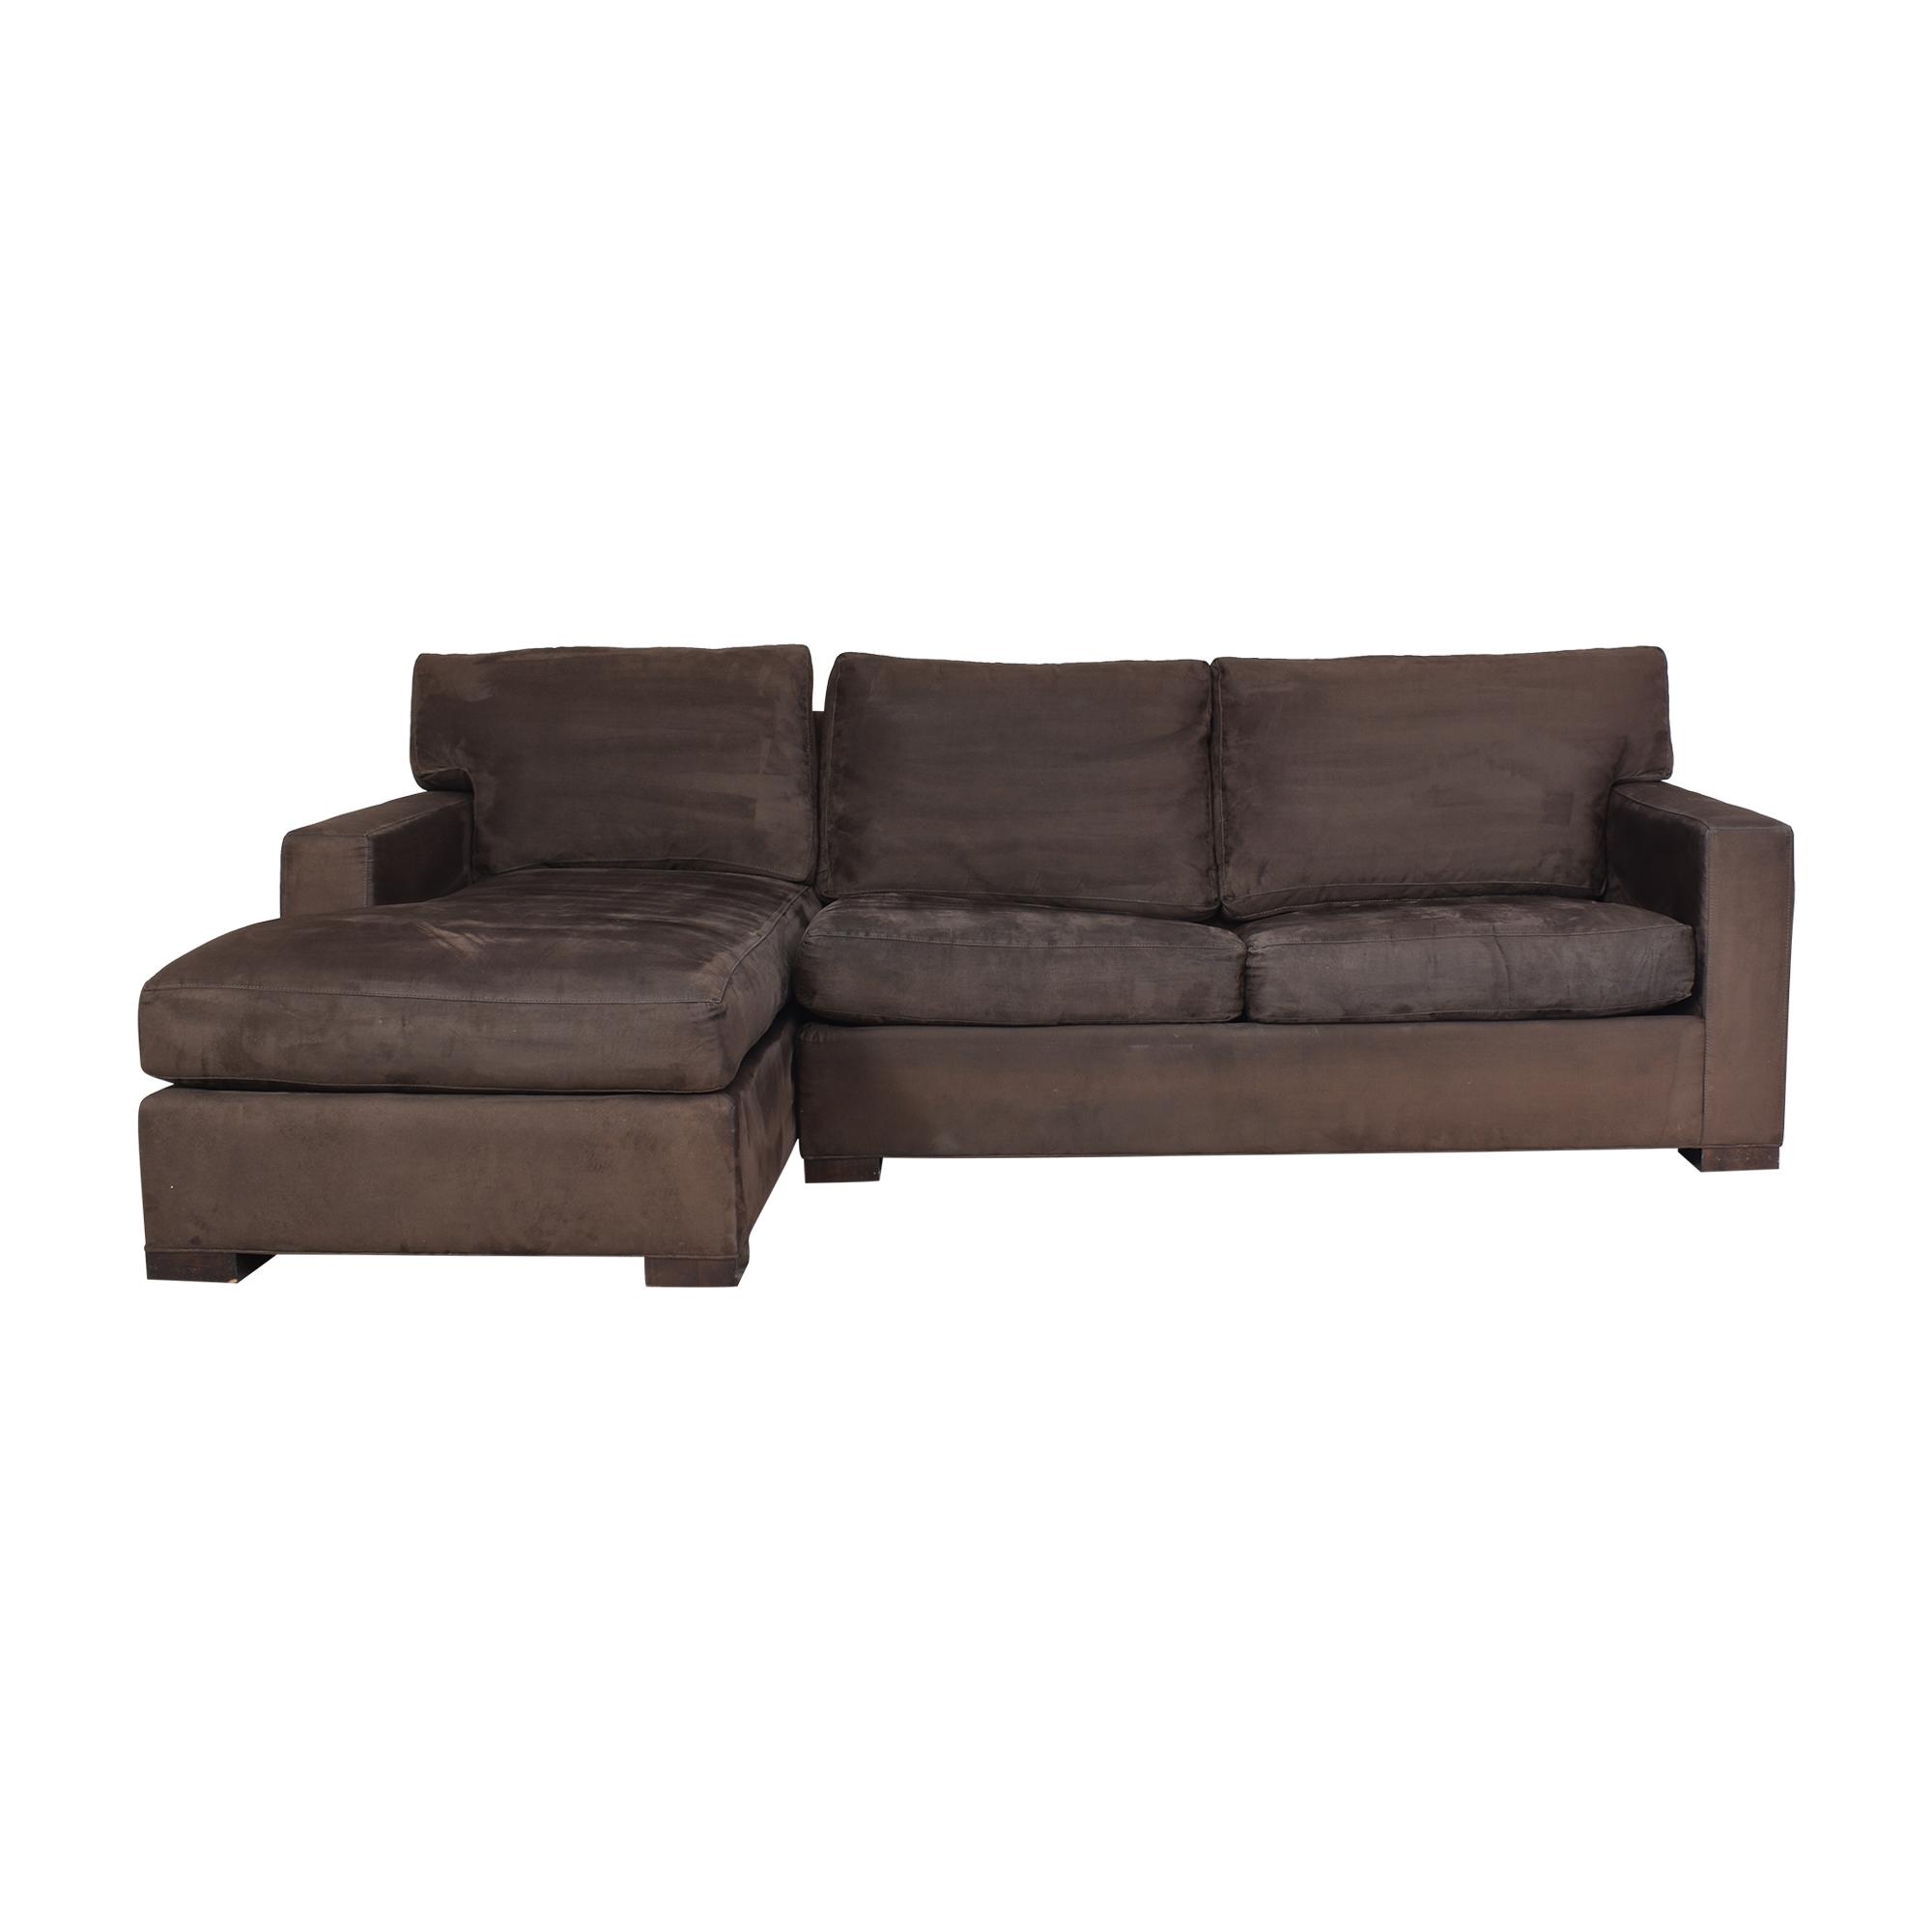 Crate & Barrel Crate & Barrel Axis Sectional Sleeper Sofa second hand